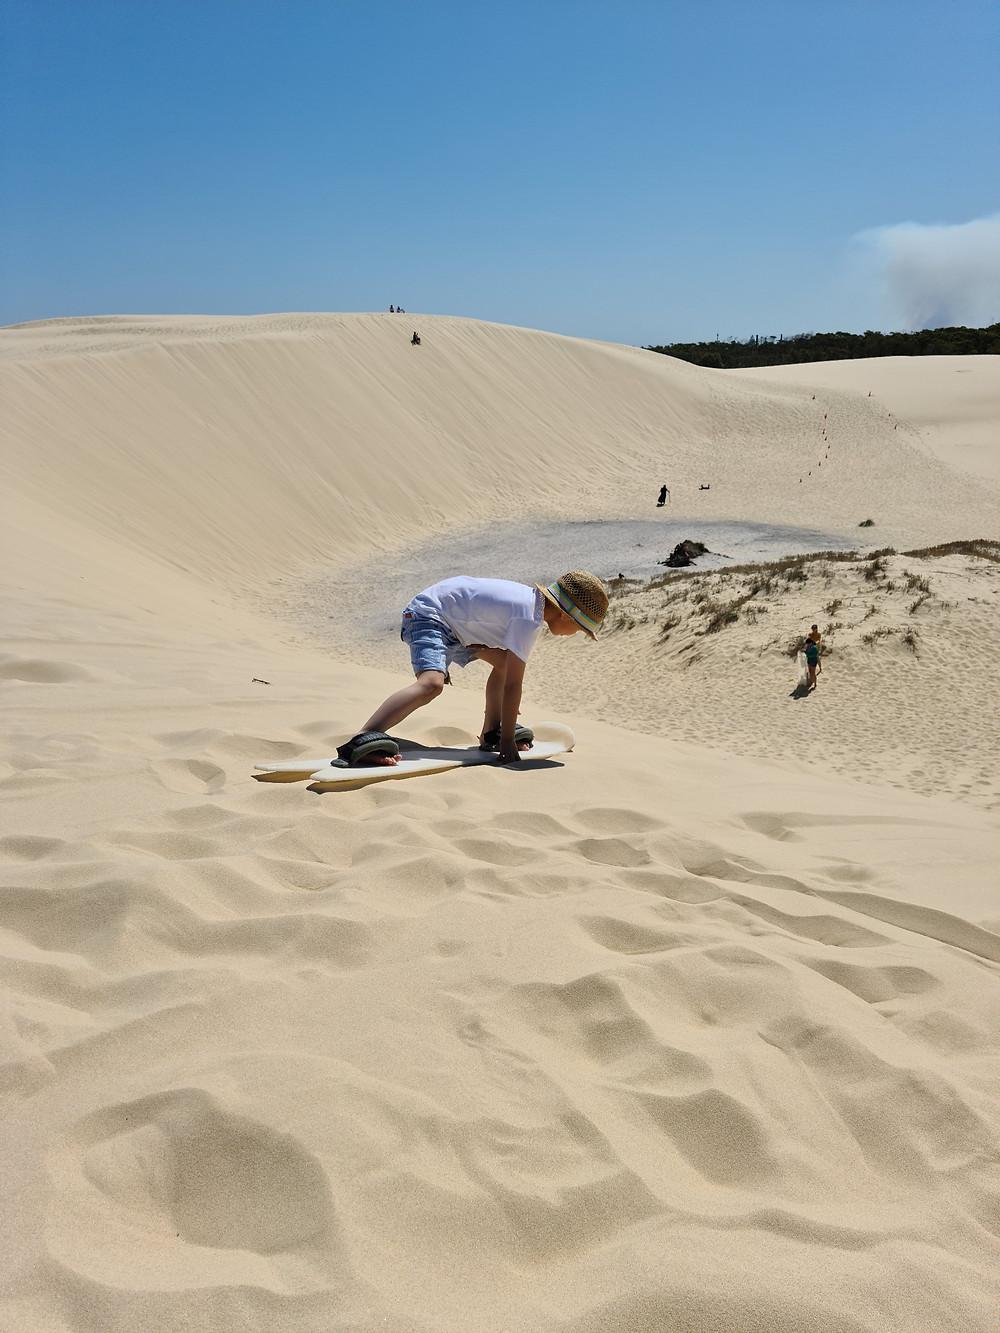 Likable Kids' Stuff | likable.com.au | Sandboarding in Port Stephens | Family fun holiday activities